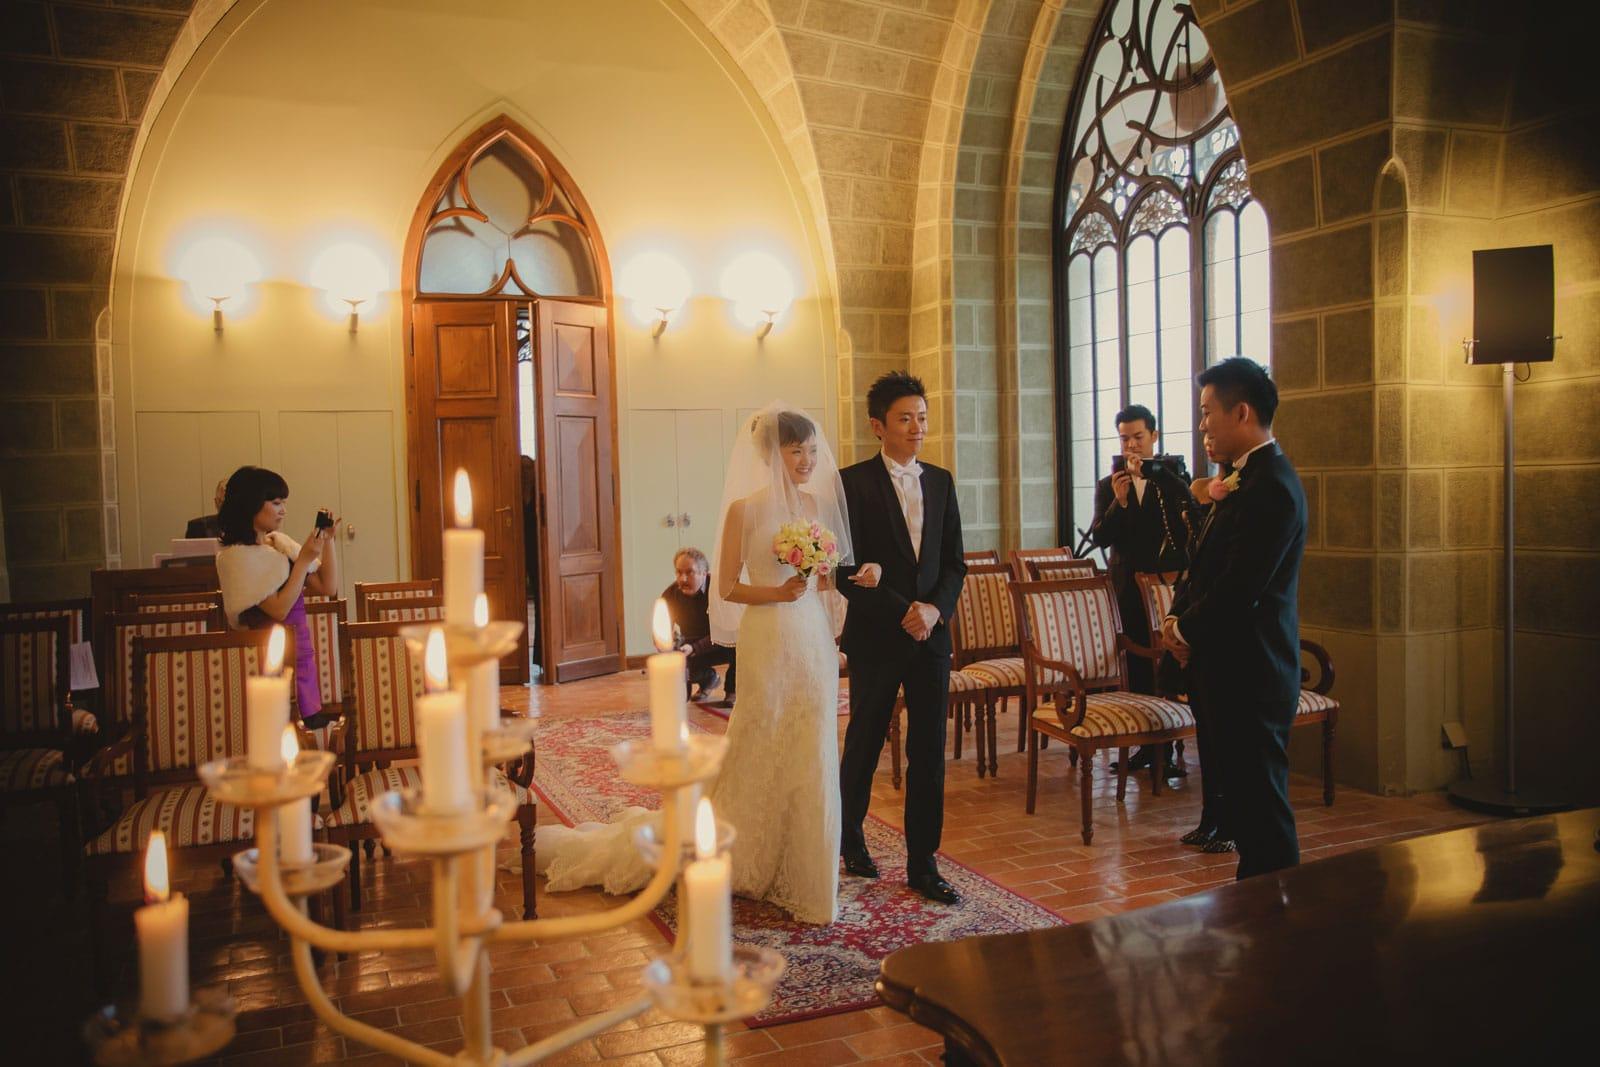 Castle Hluboka nad Vltavou wedding / Suki & Steven / wedding photography